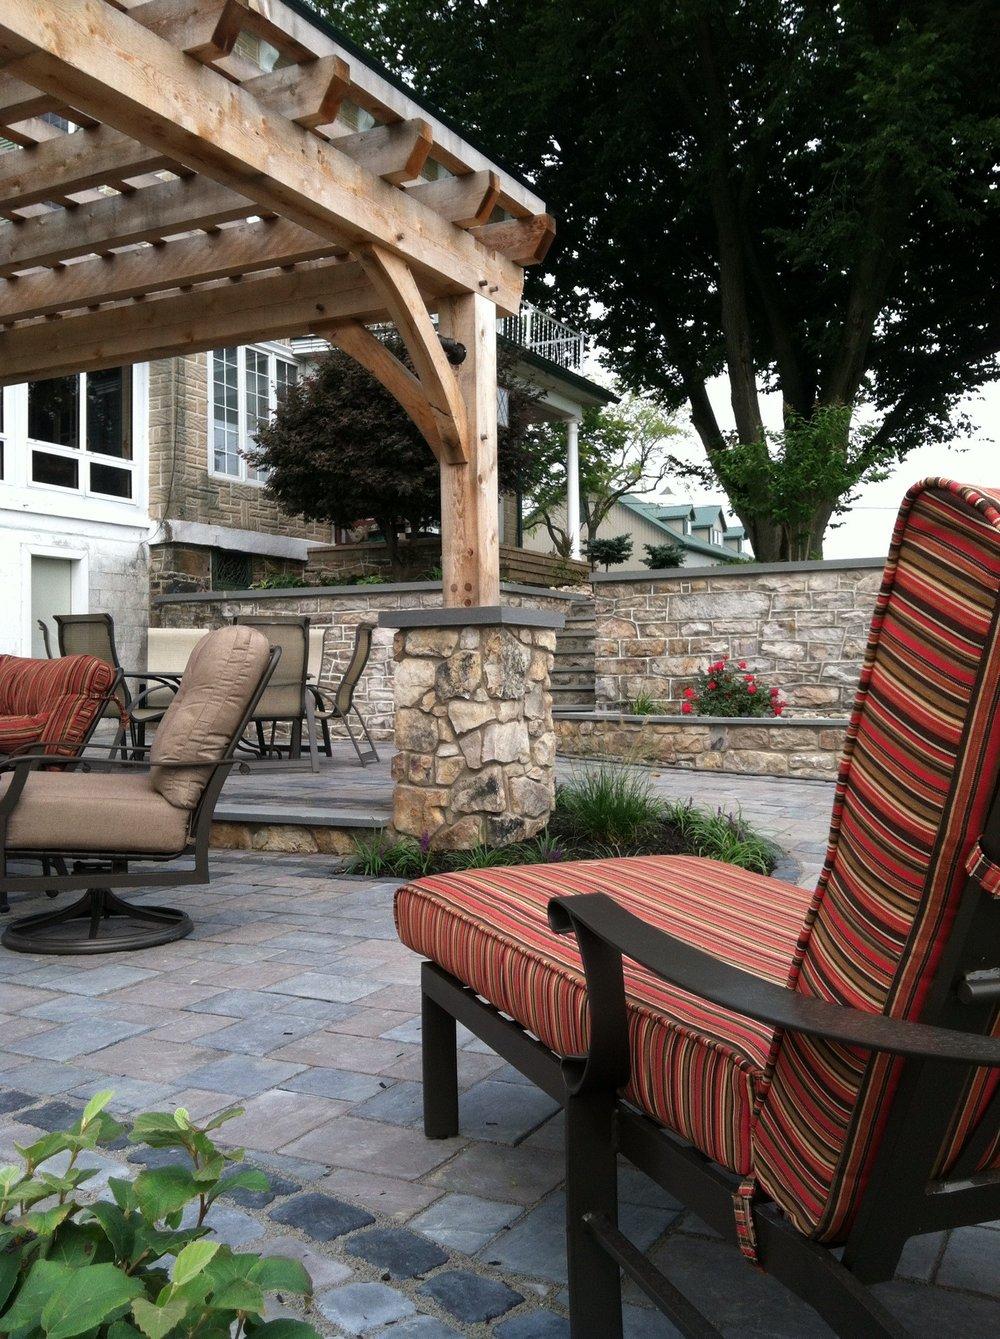 Landscape contractor with top landscape patio ideas in Lebanon, Lebanon County, PA